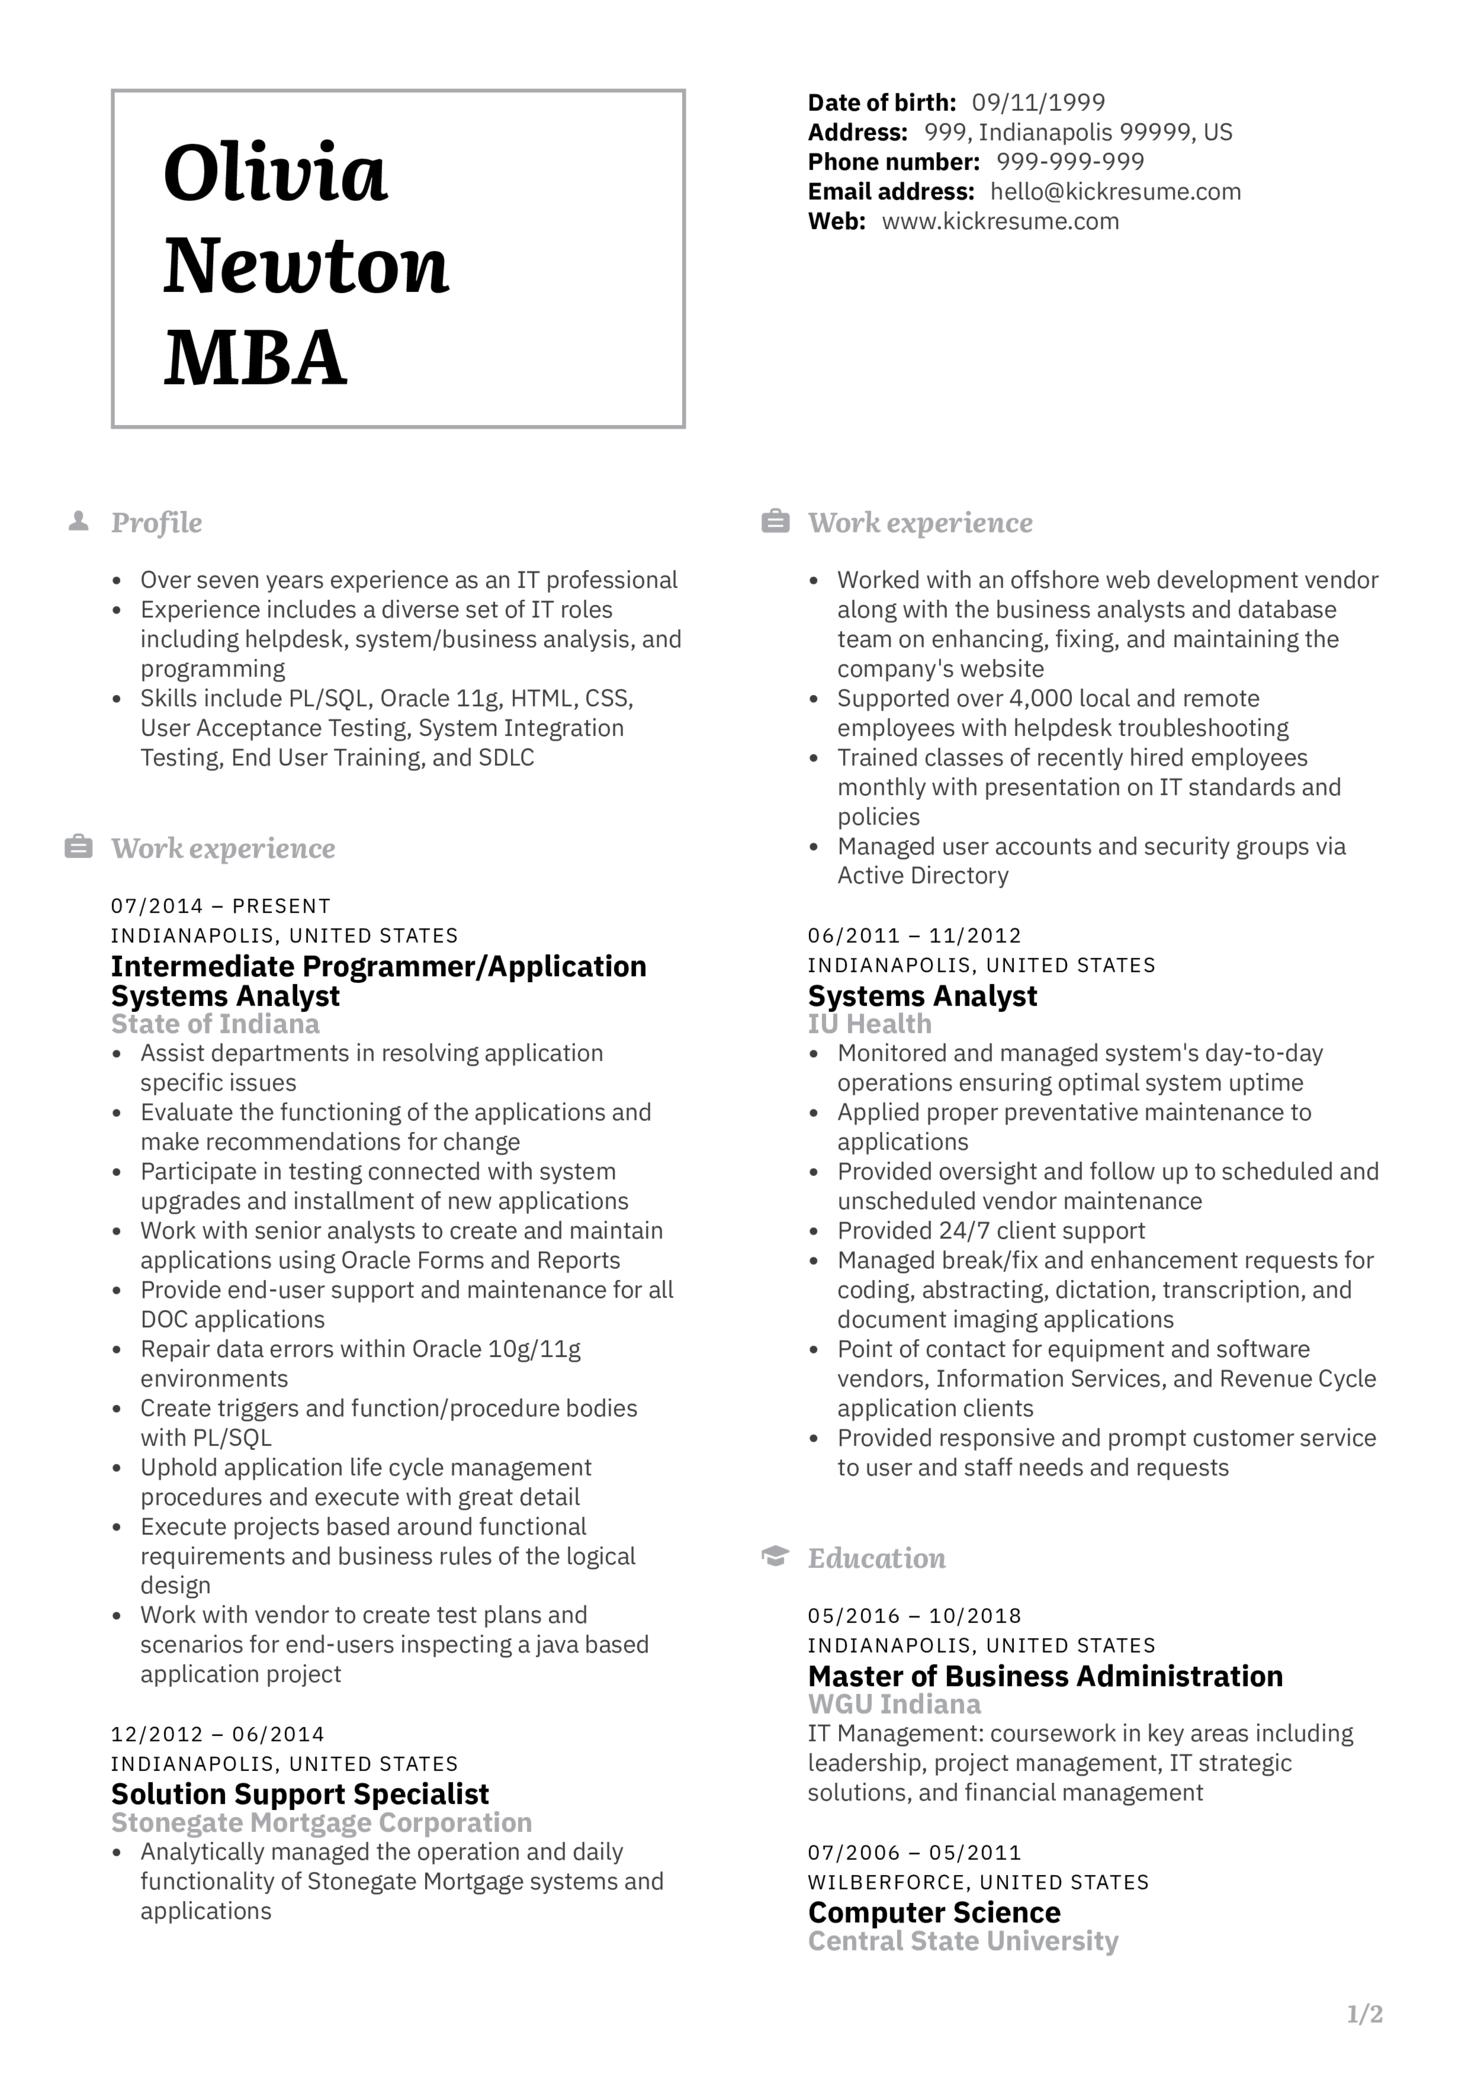 Senior Systems Analyst CV Sample (Part 1)